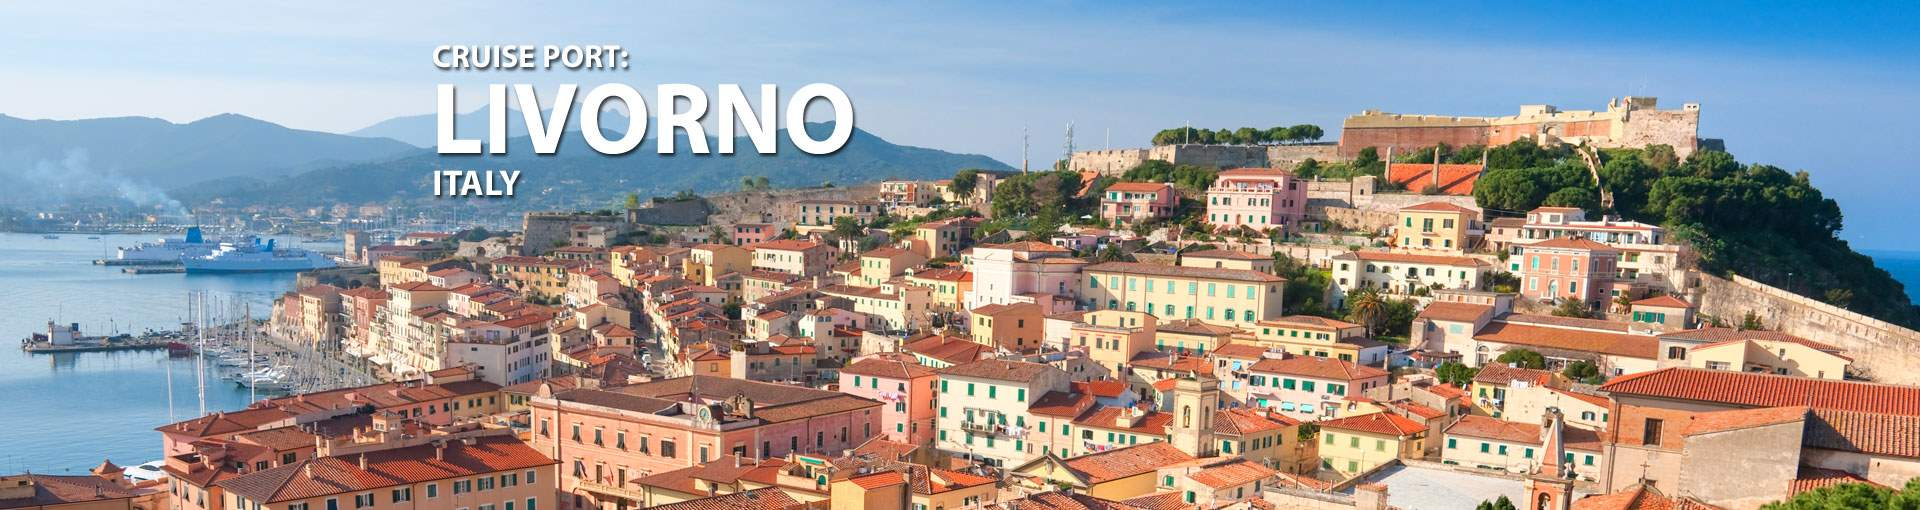 Cruises to Livorno Florence, Pisa, Italy